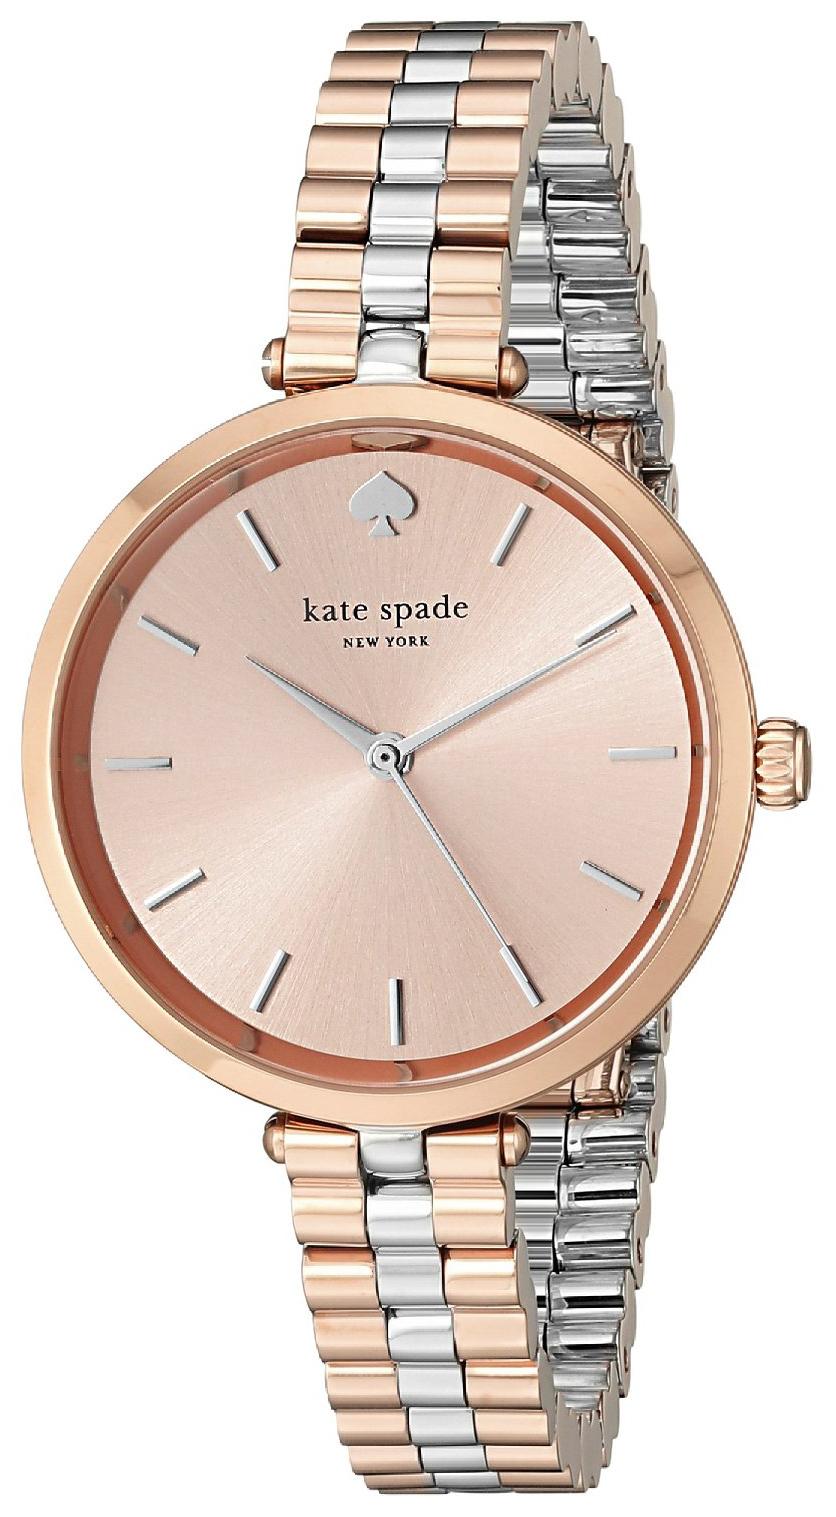 Kate Spade 99999 Dameklokke 1YRU0860 Rosegullfarget/Rose-gulltonet - Kate Spade